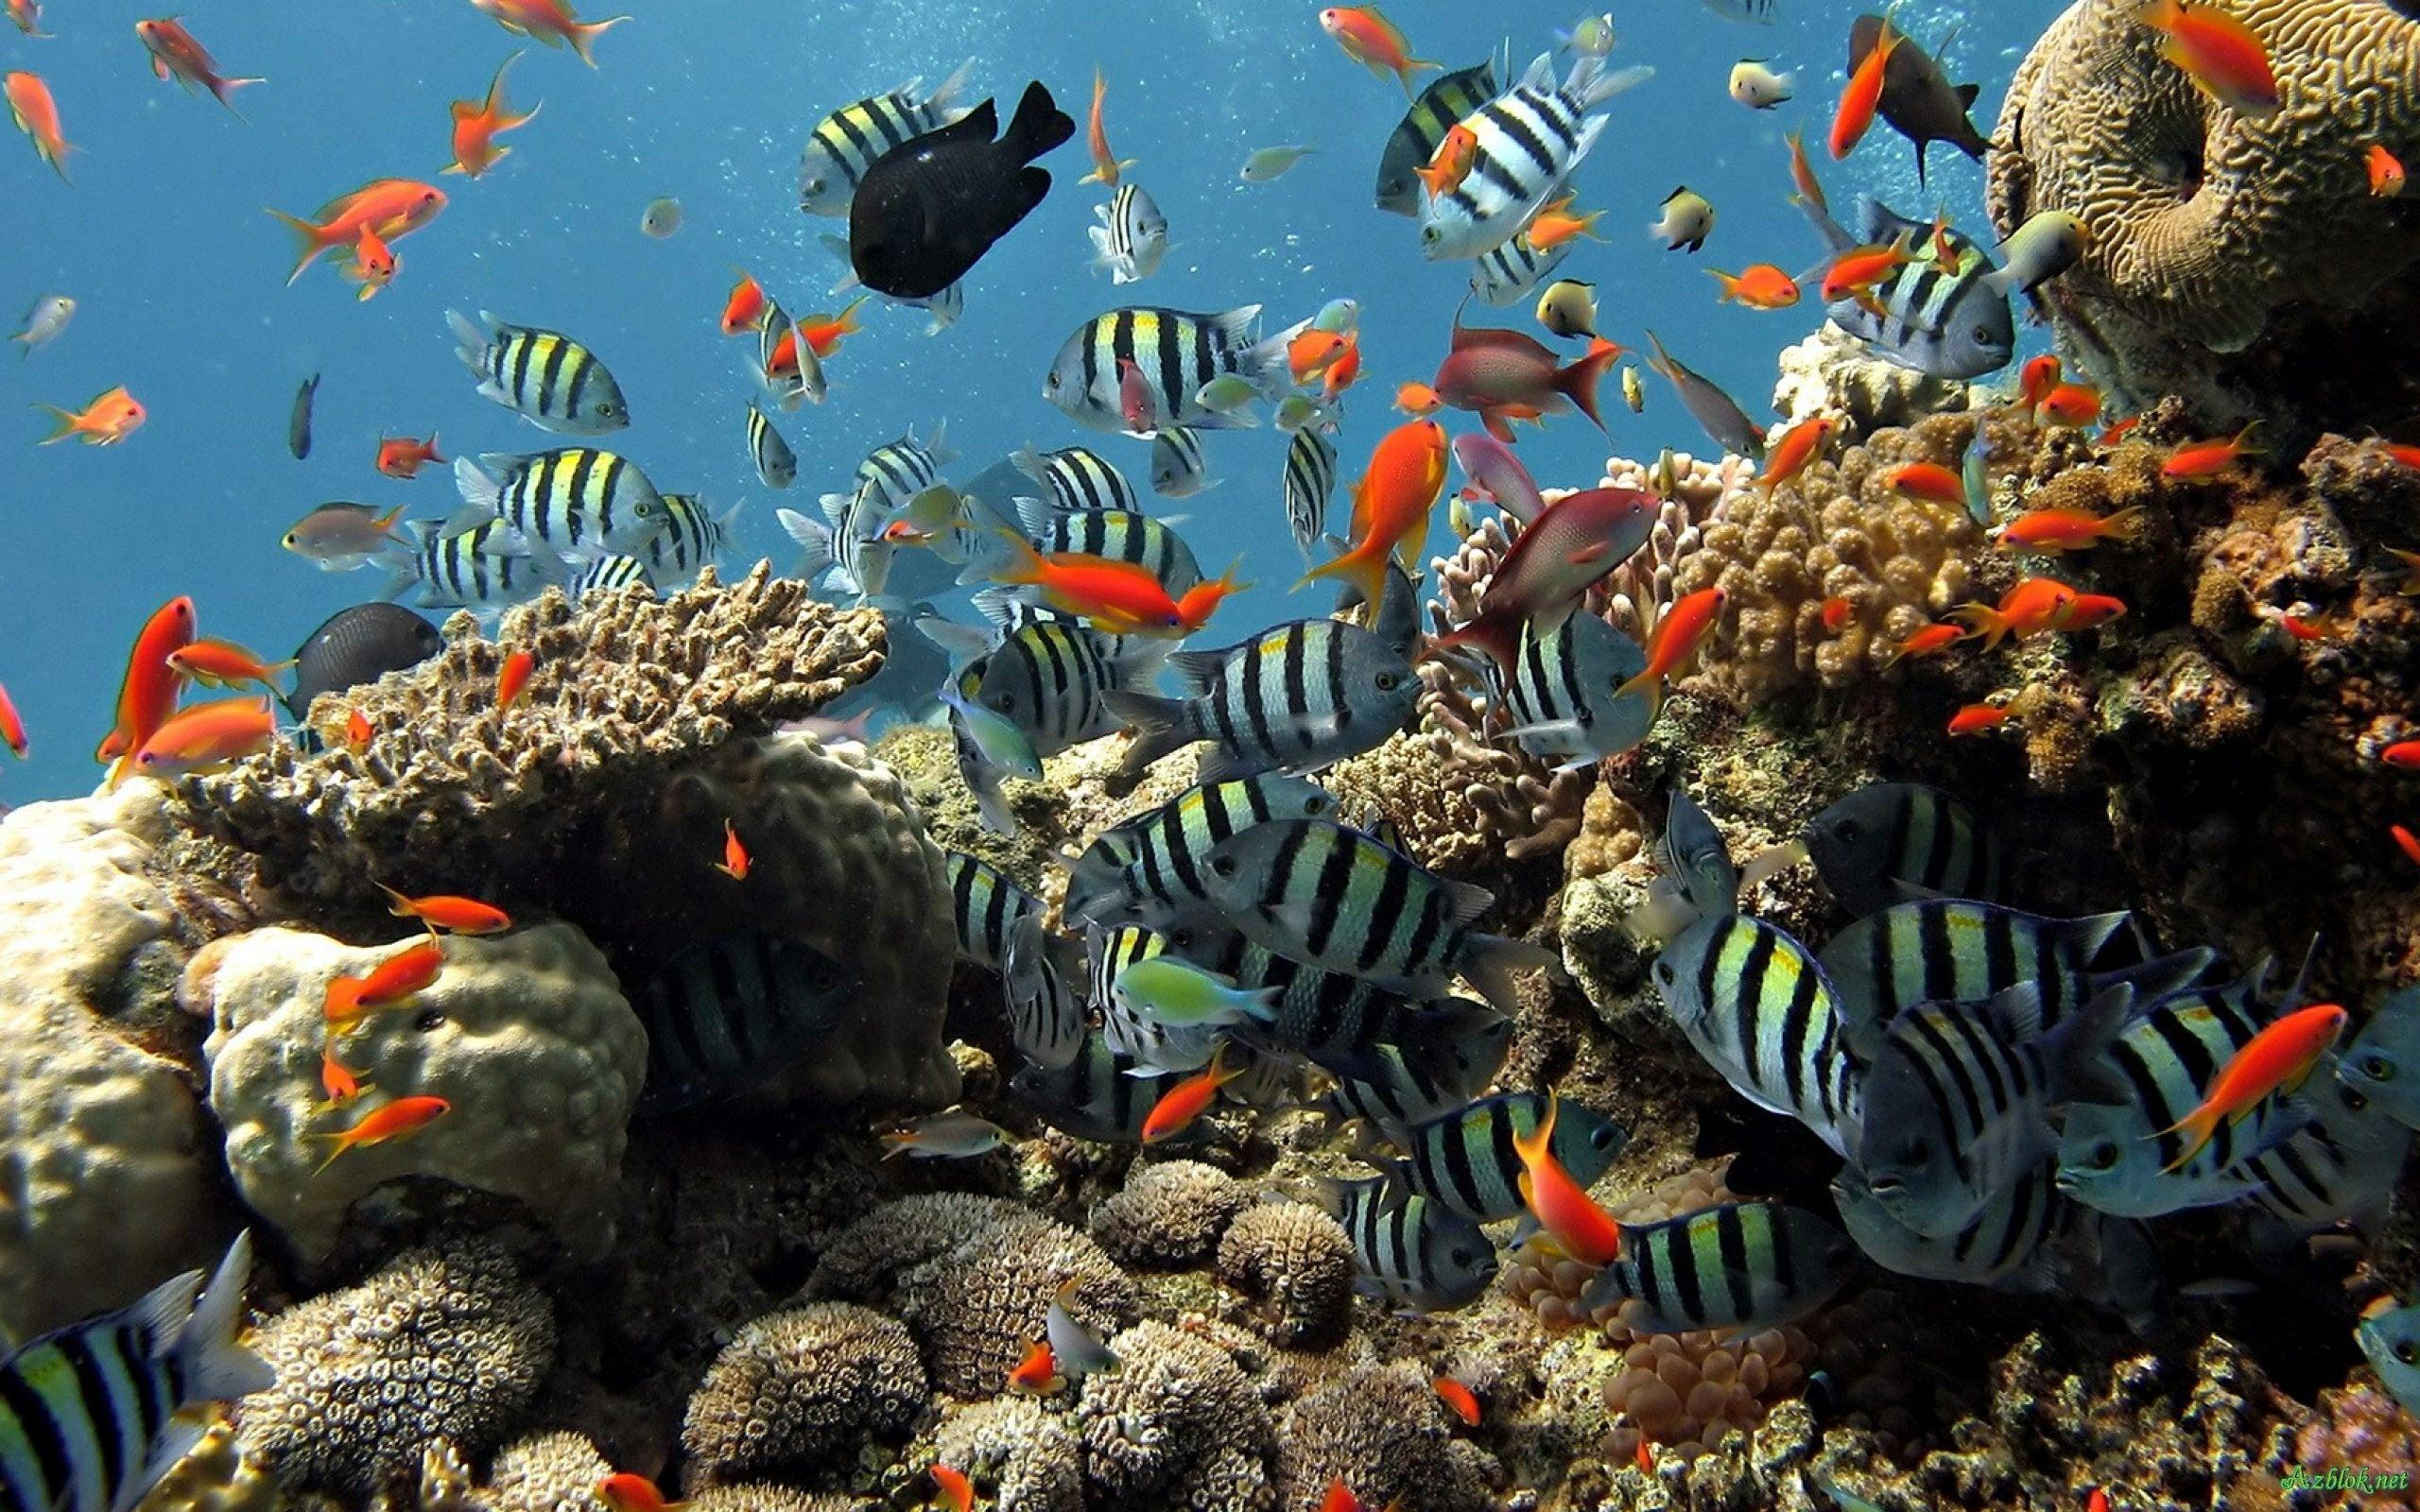 67 Live Desktop Wallpapers On Wallpaperplay Aquarium Live Wallpaper Fish Fish Wallpaper